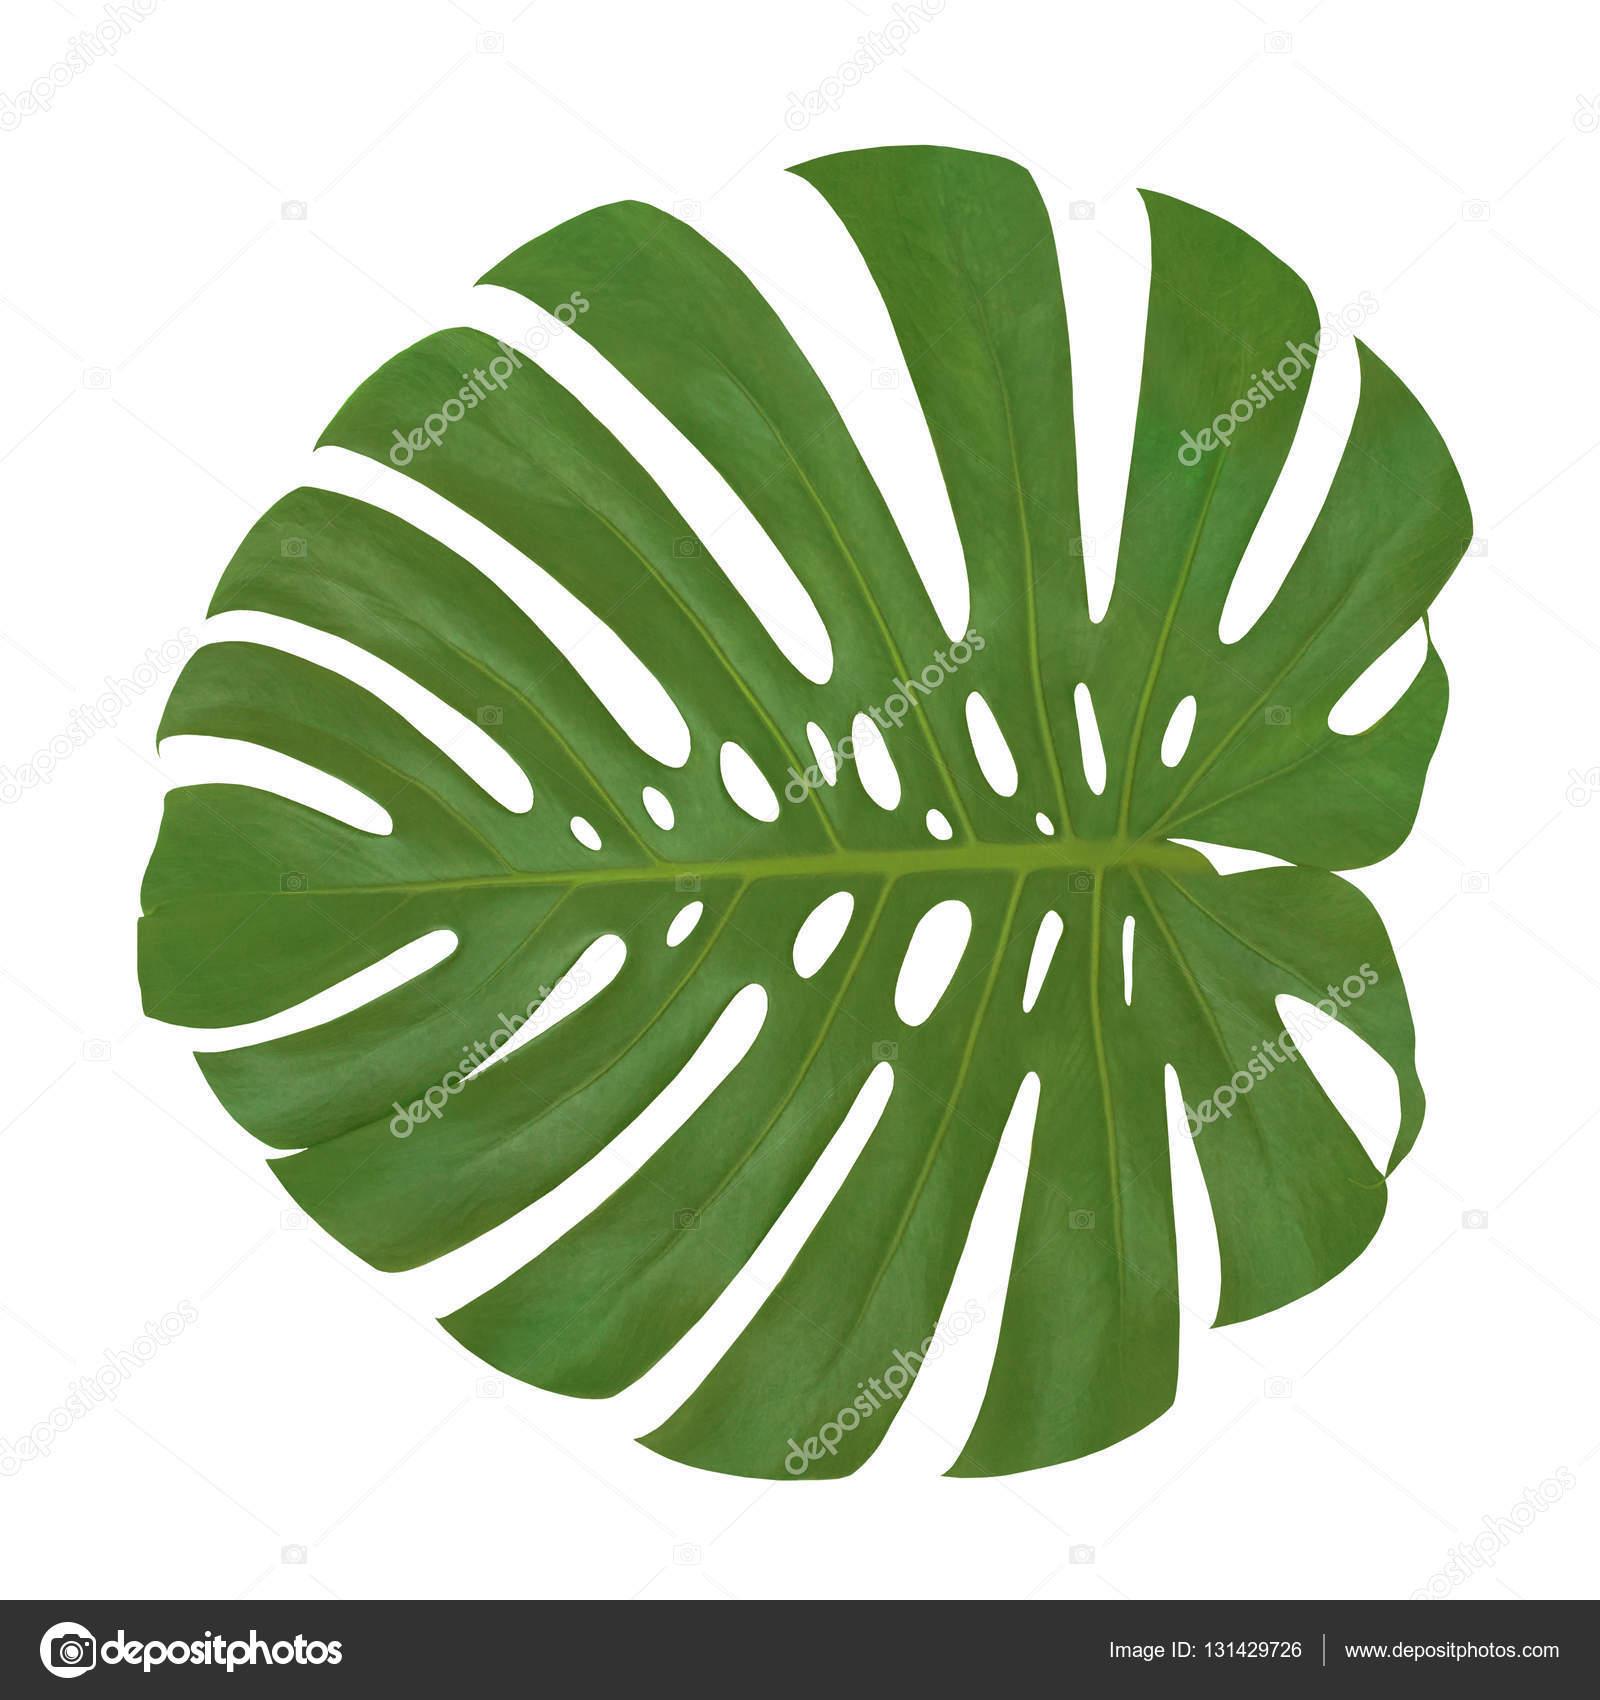 Feuille plante images download cv letter and format for Plante palmier